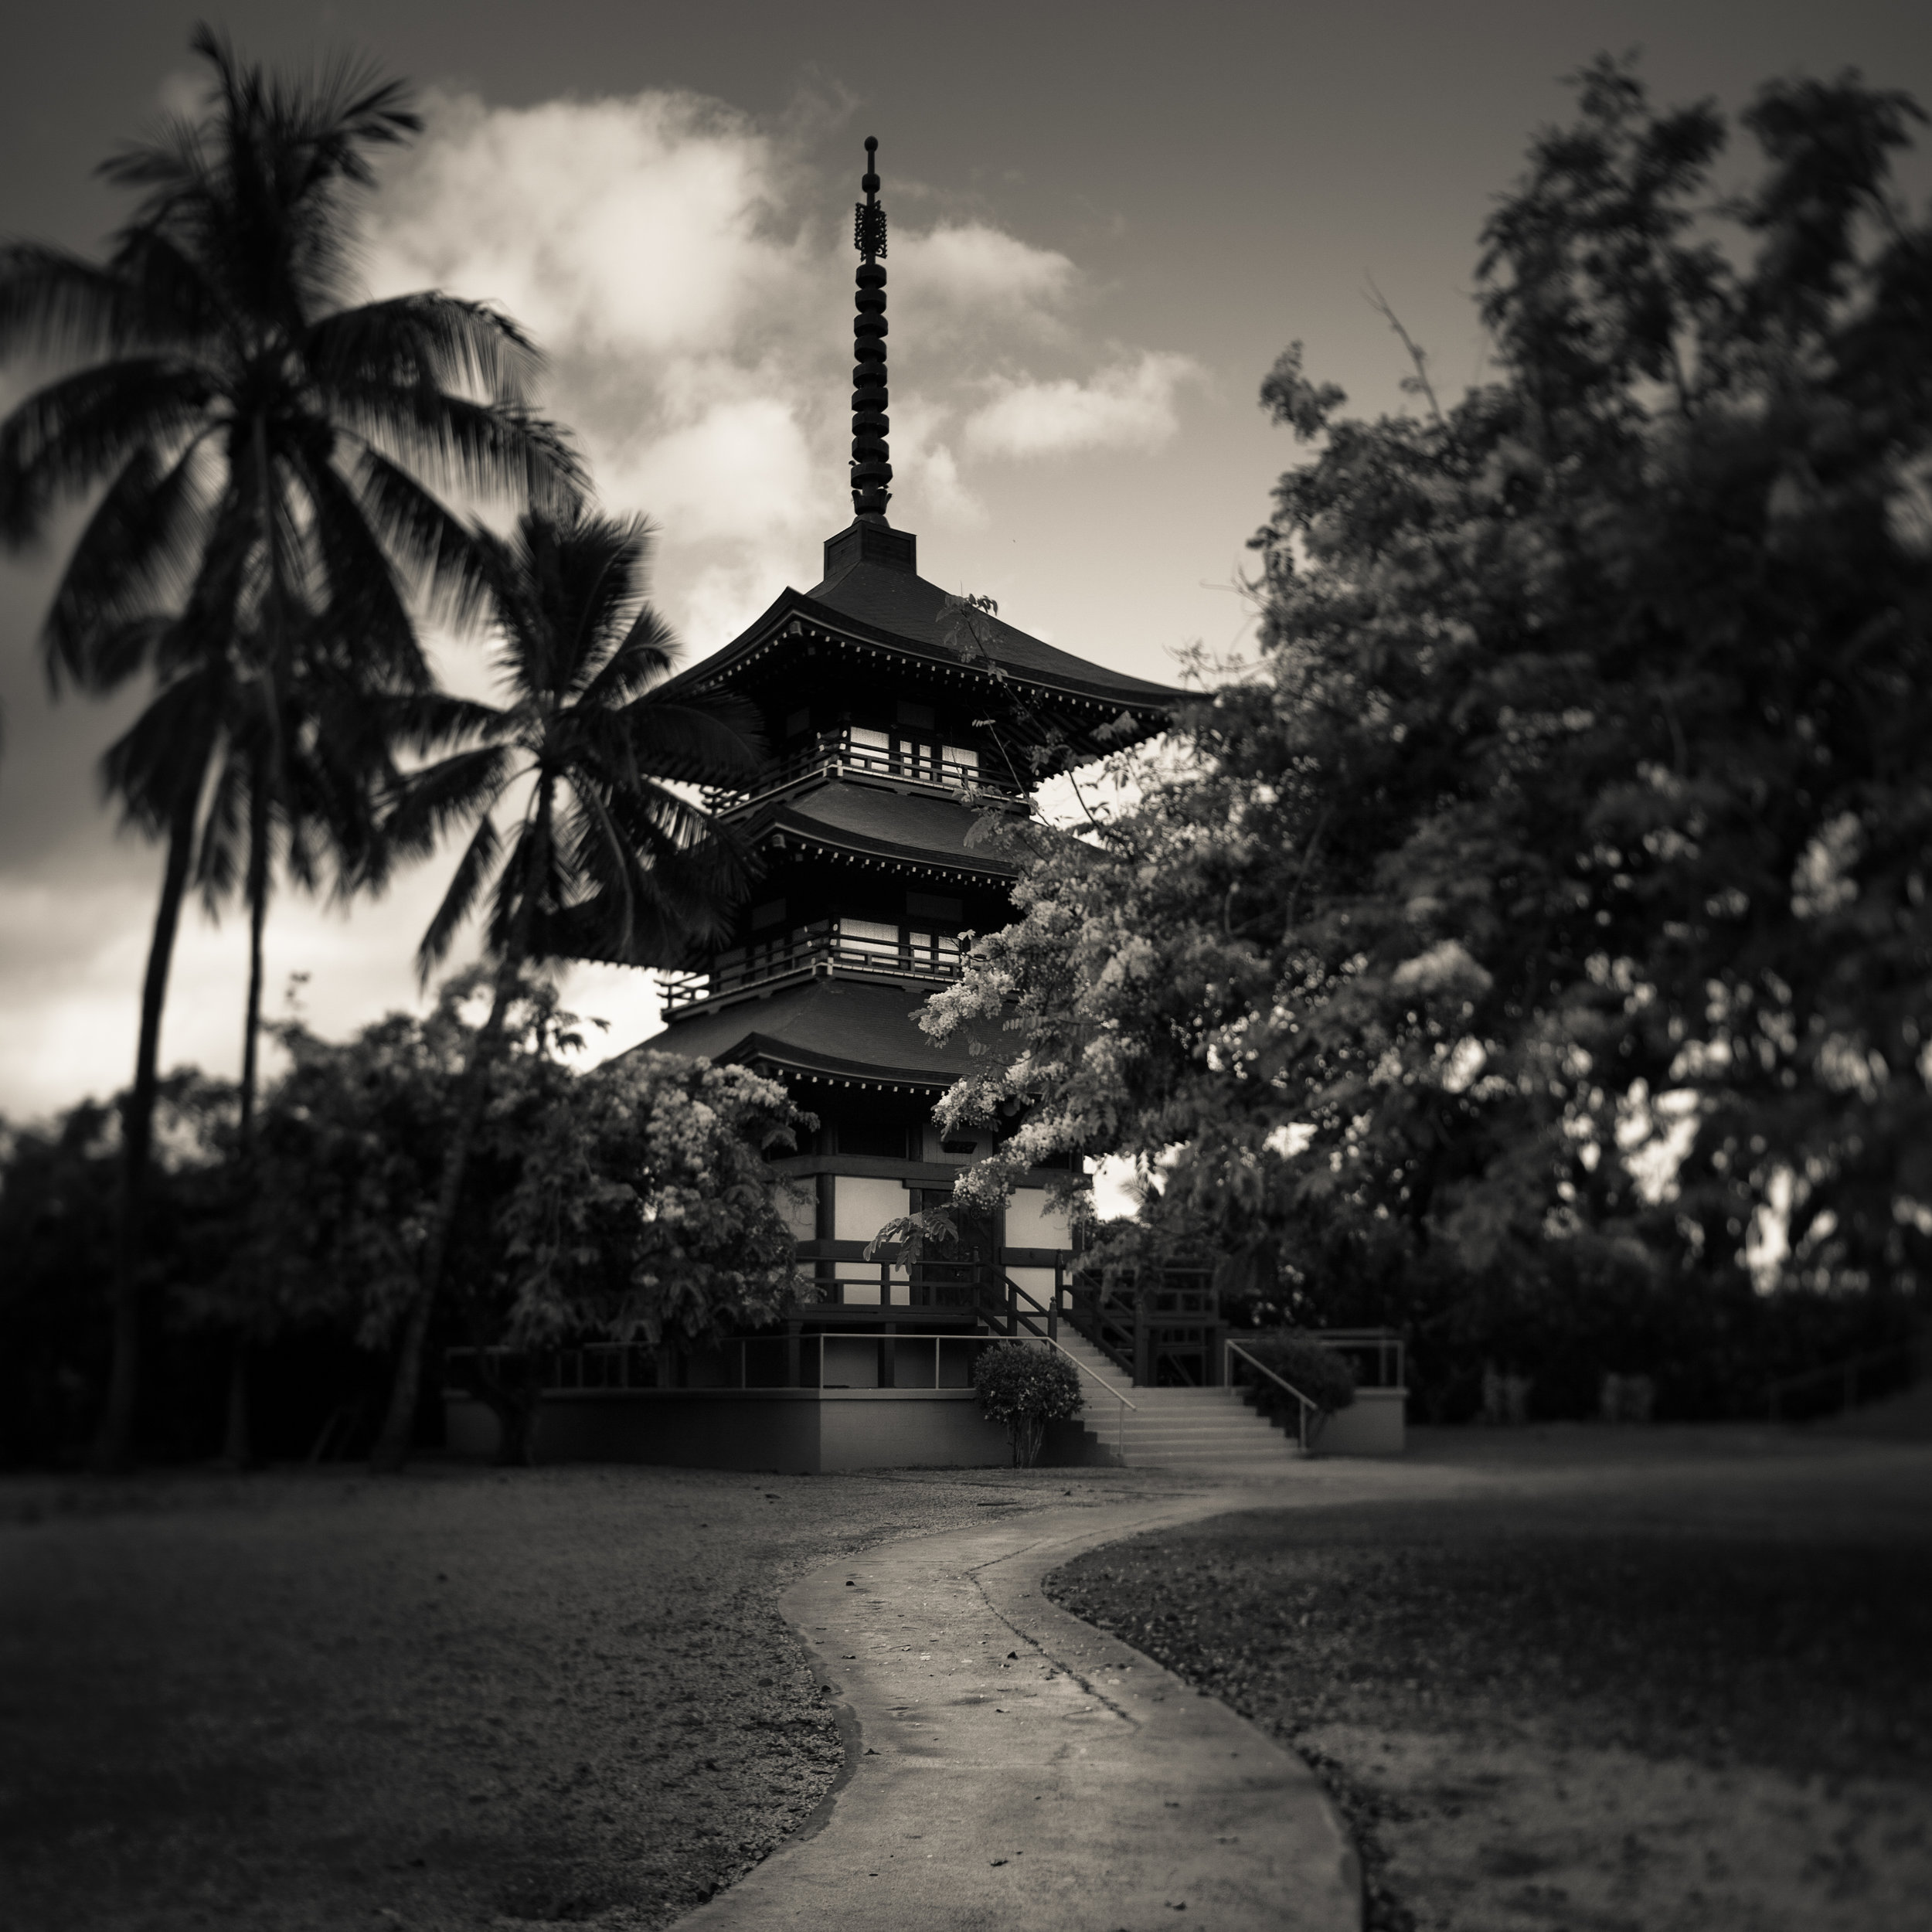 Maui Lahaina Jodo temple black white buddhist pagoda japanese